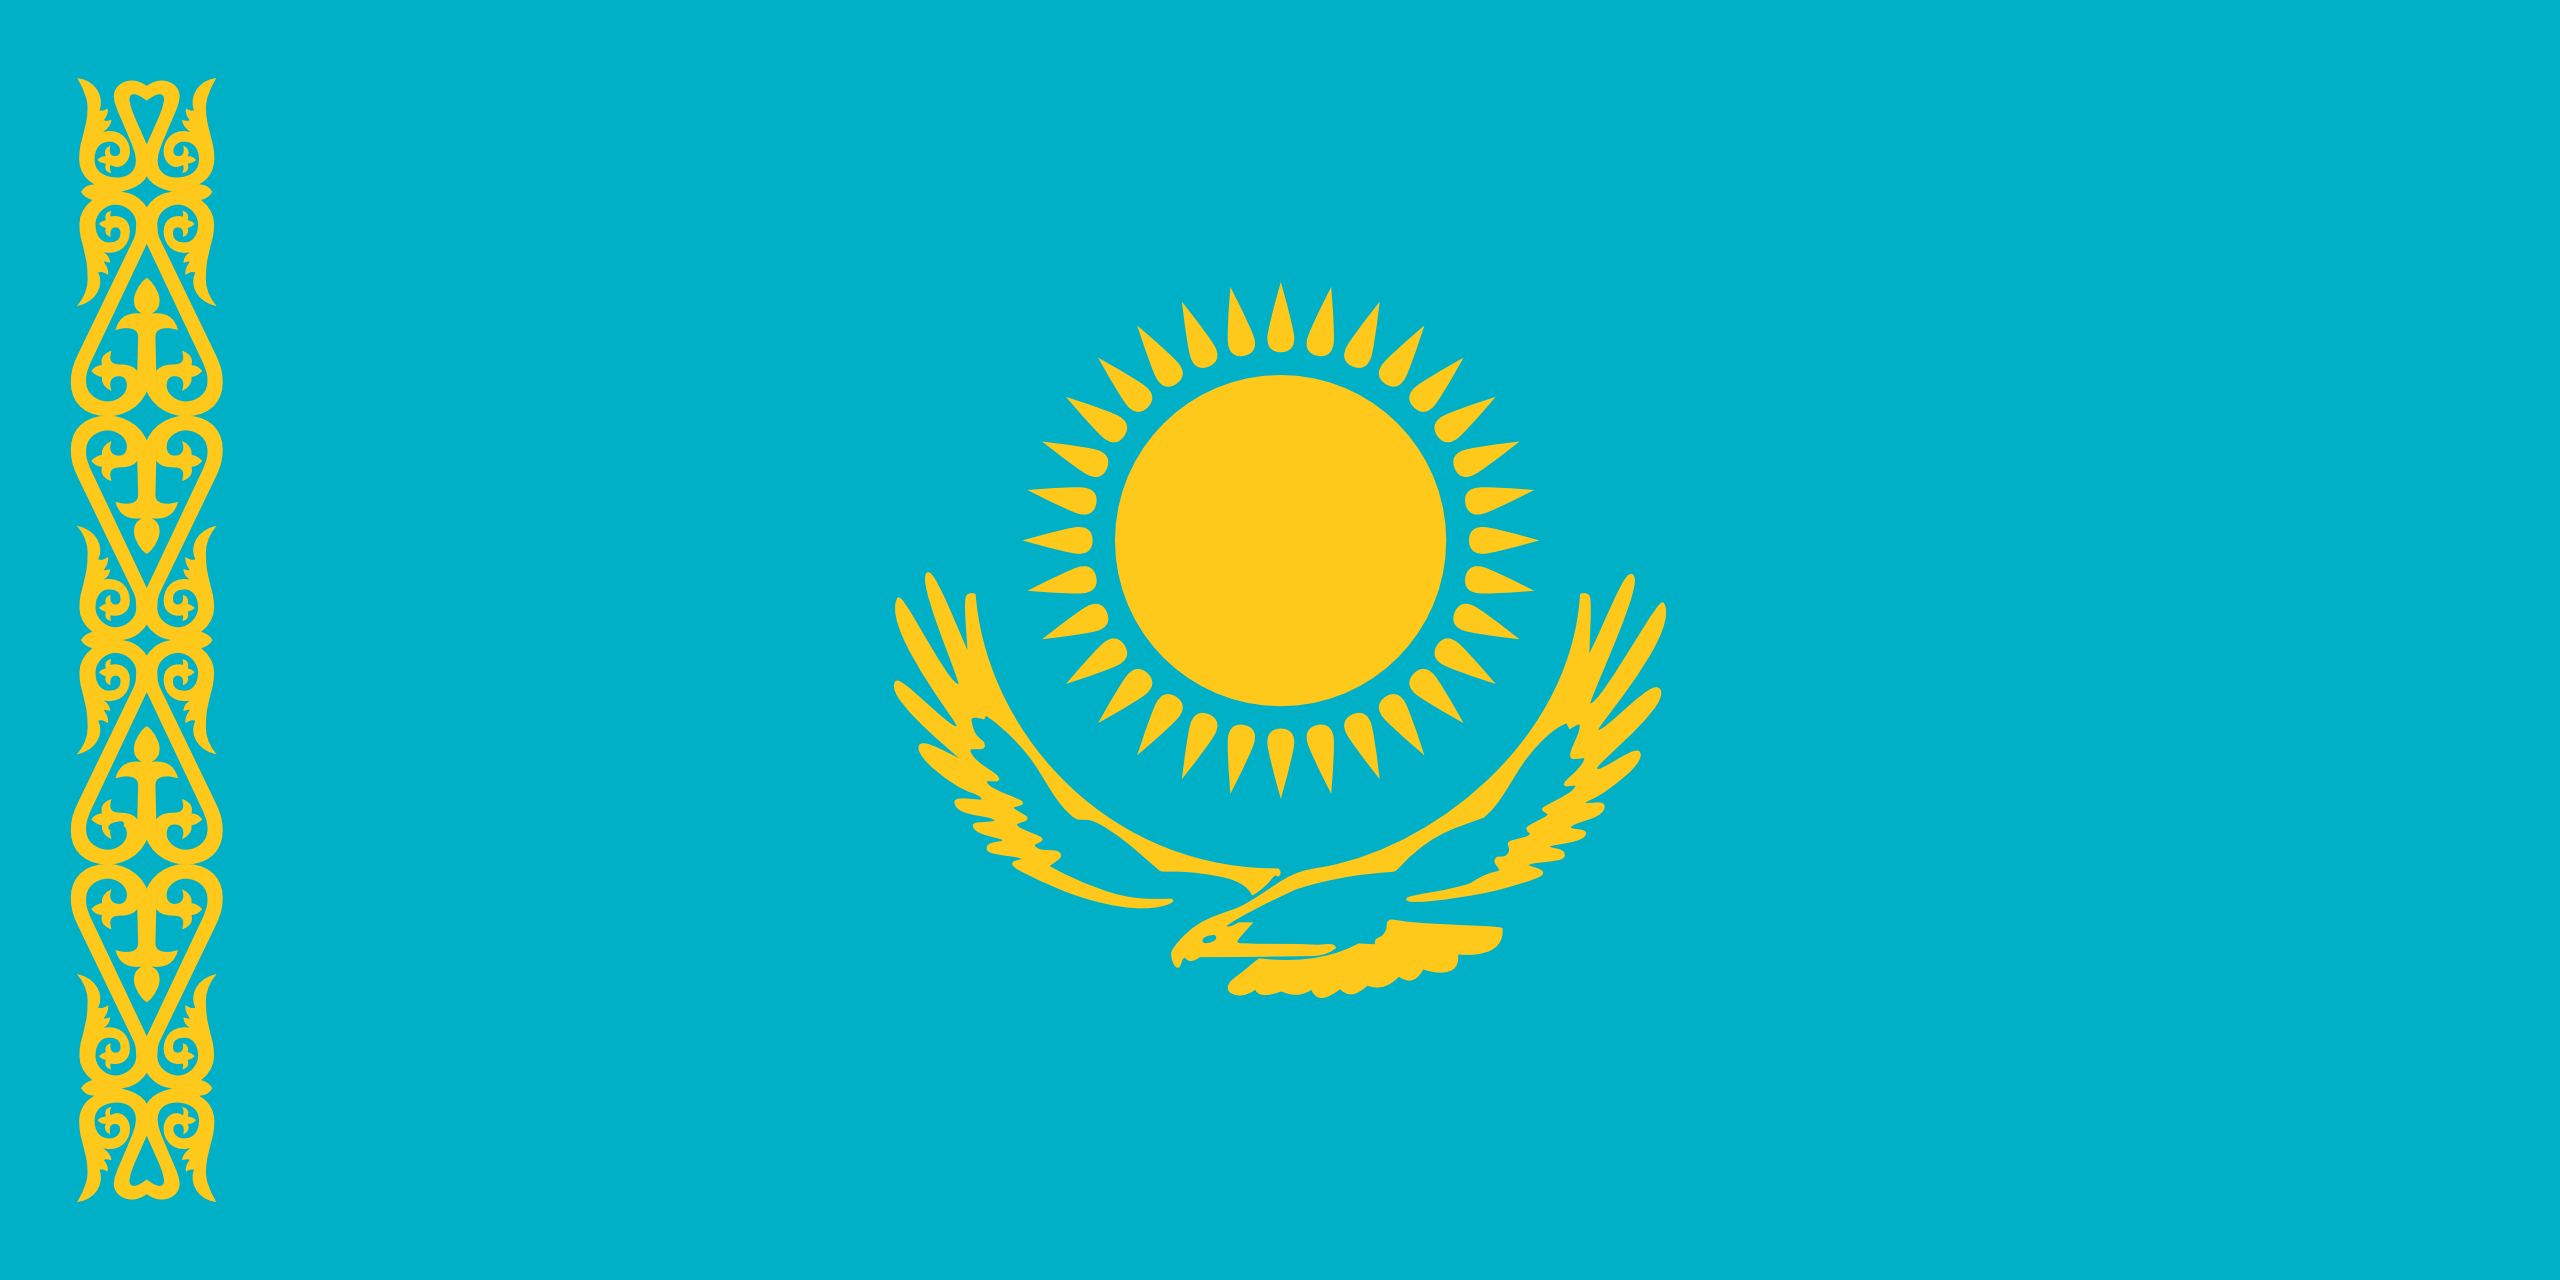 Казахстан, страна, Эмблема, логотип, символ - Обои HD - Профессор falken.com